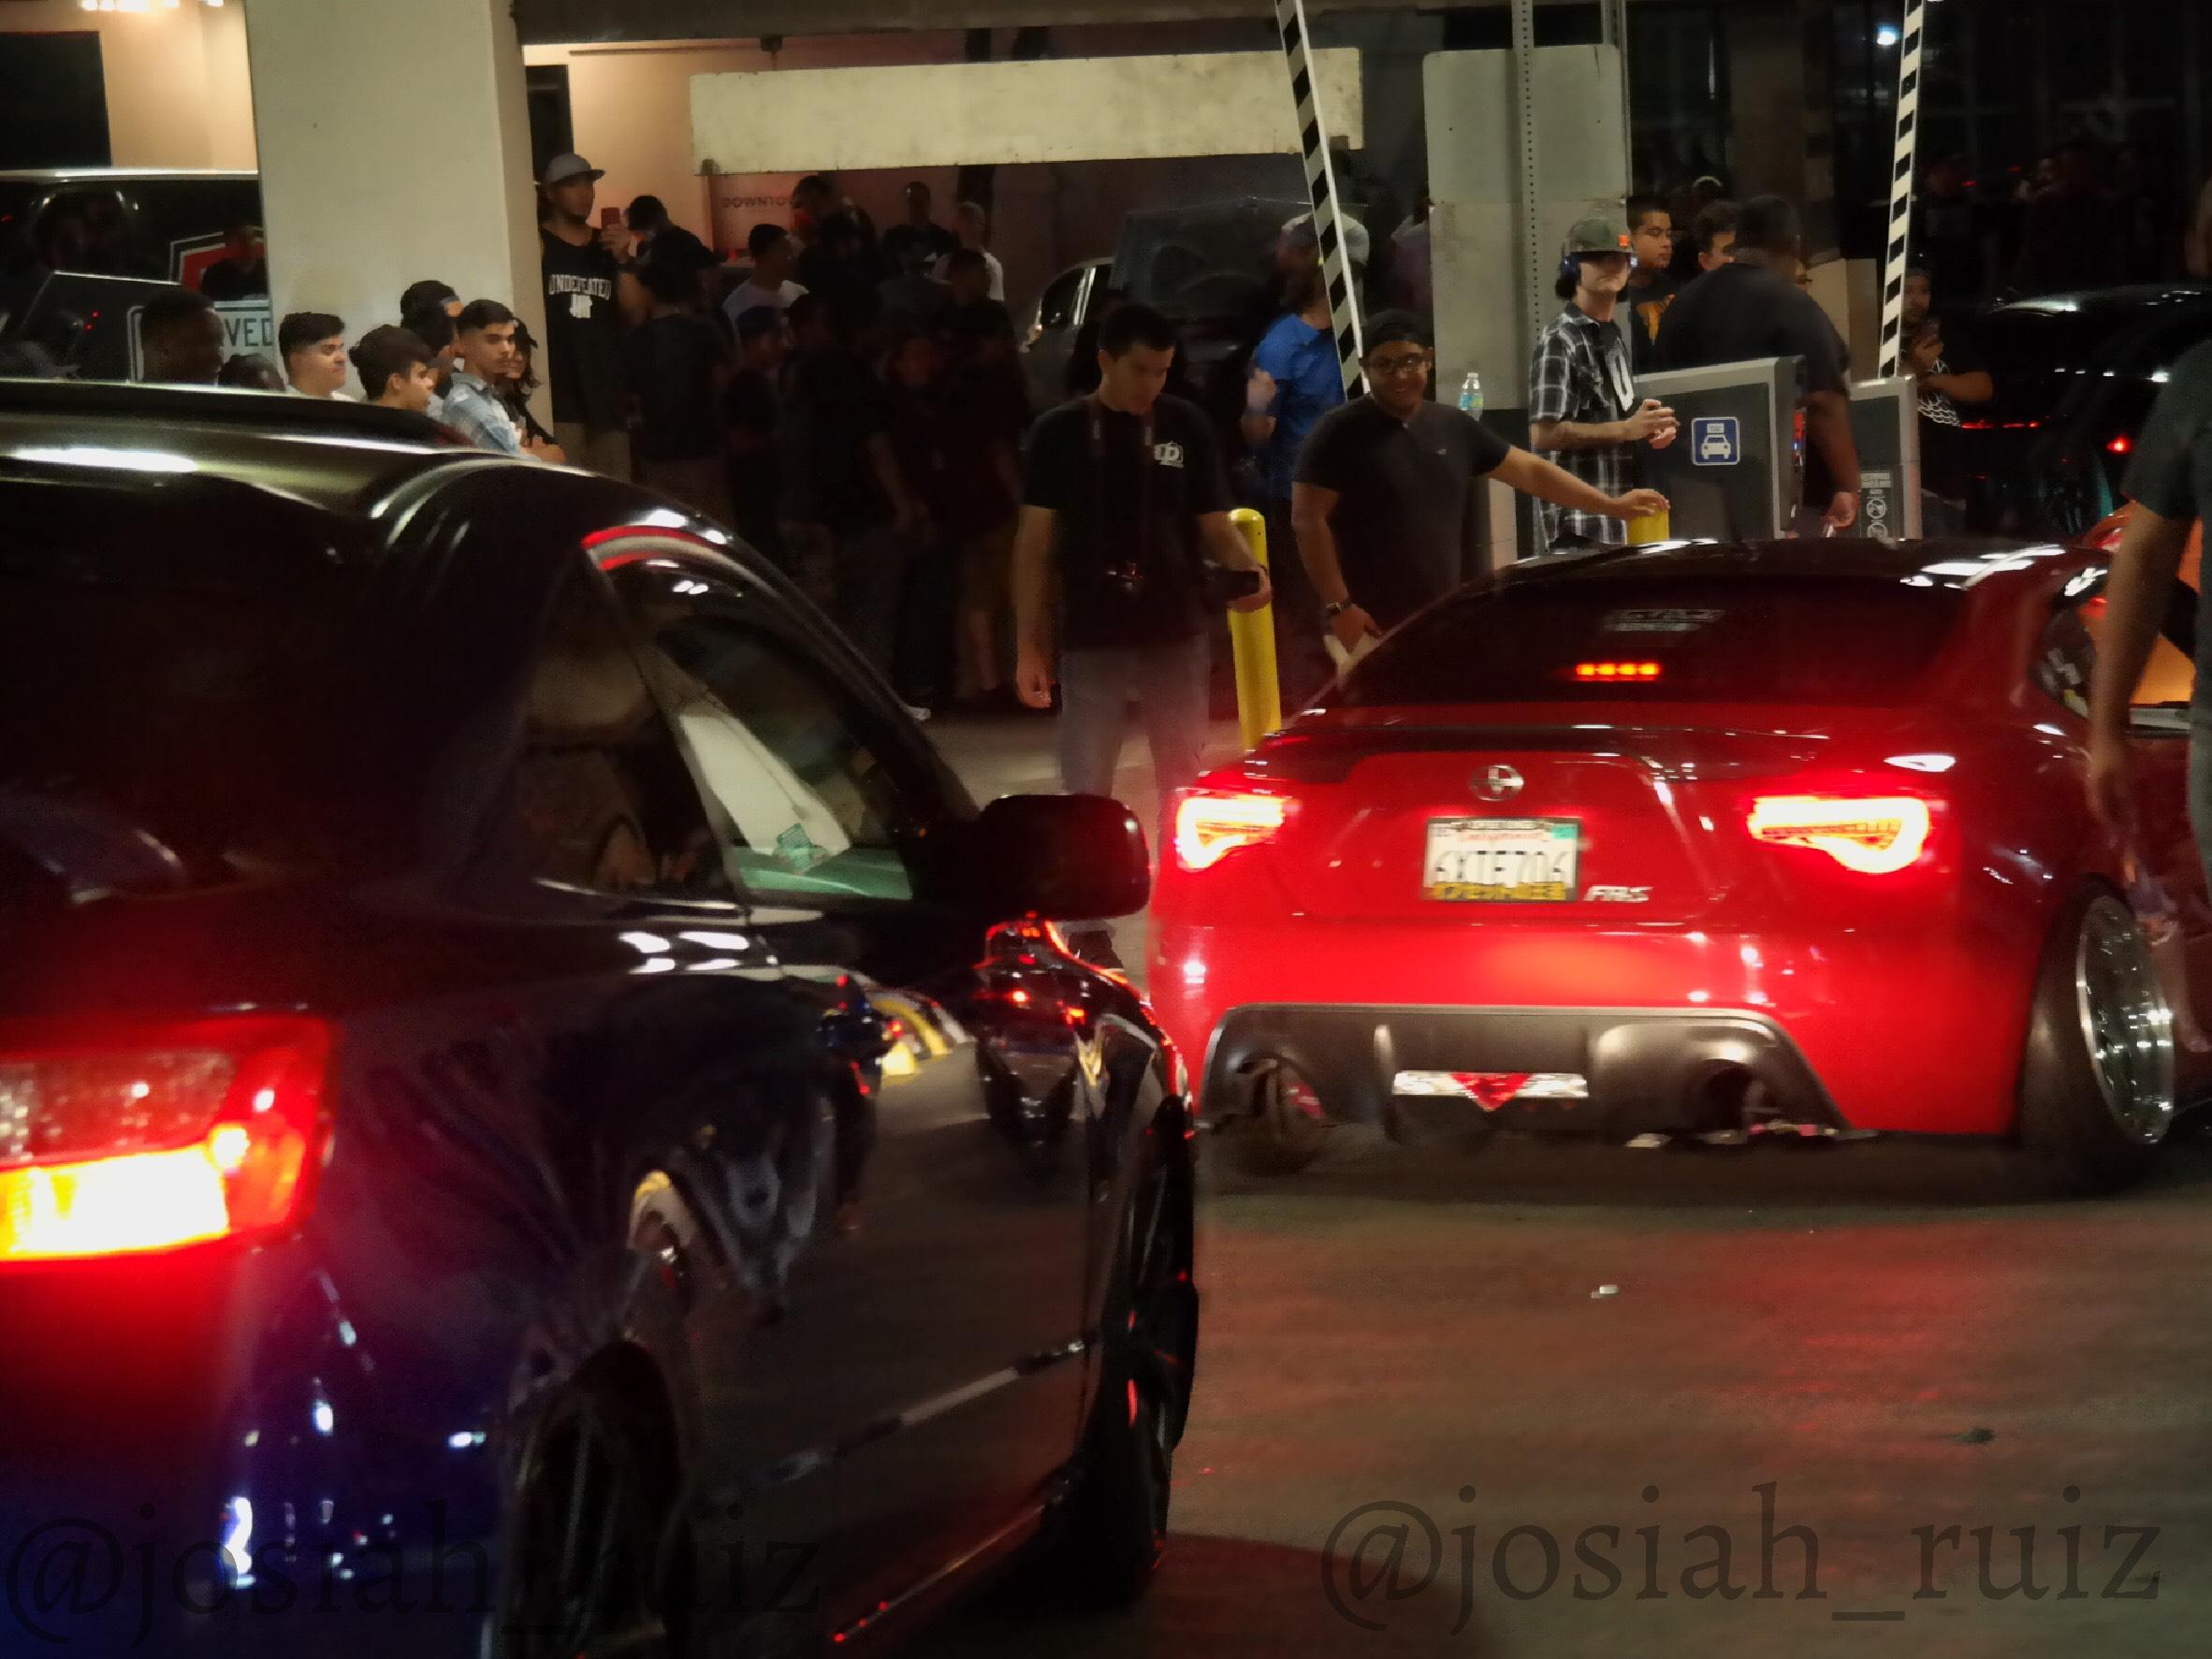 Night Car Meet Pic 1